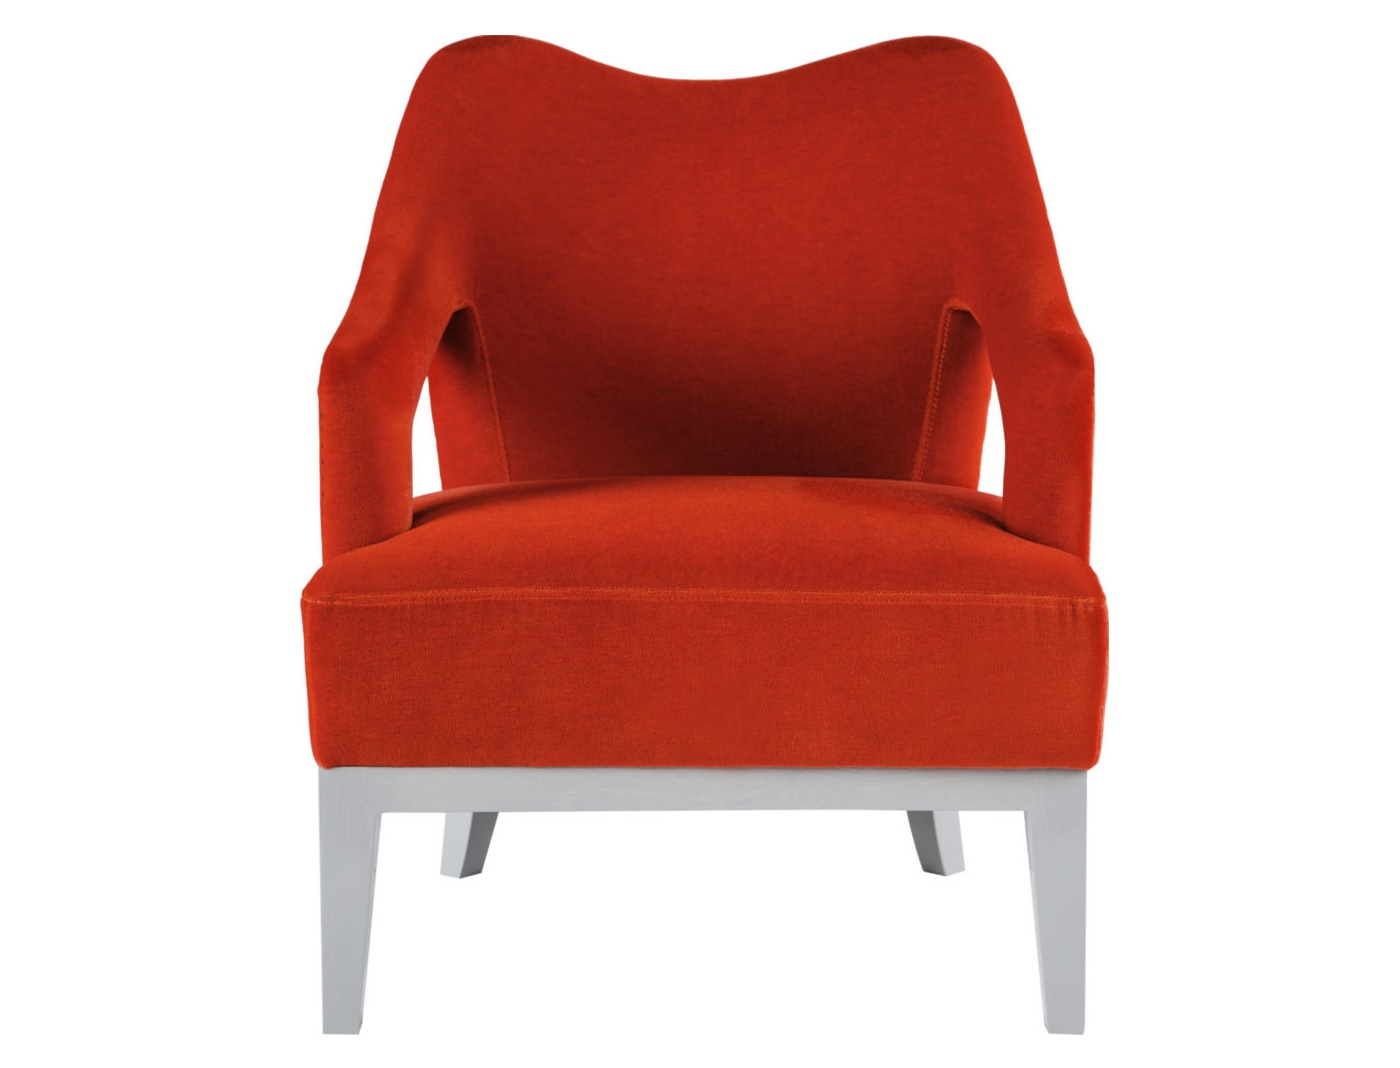 Кресло HelenИнтерьерные кресла<br><br><br>Material: Текстиль<br>Width см: 72<br>Depth см: 80<br>Height см: 85